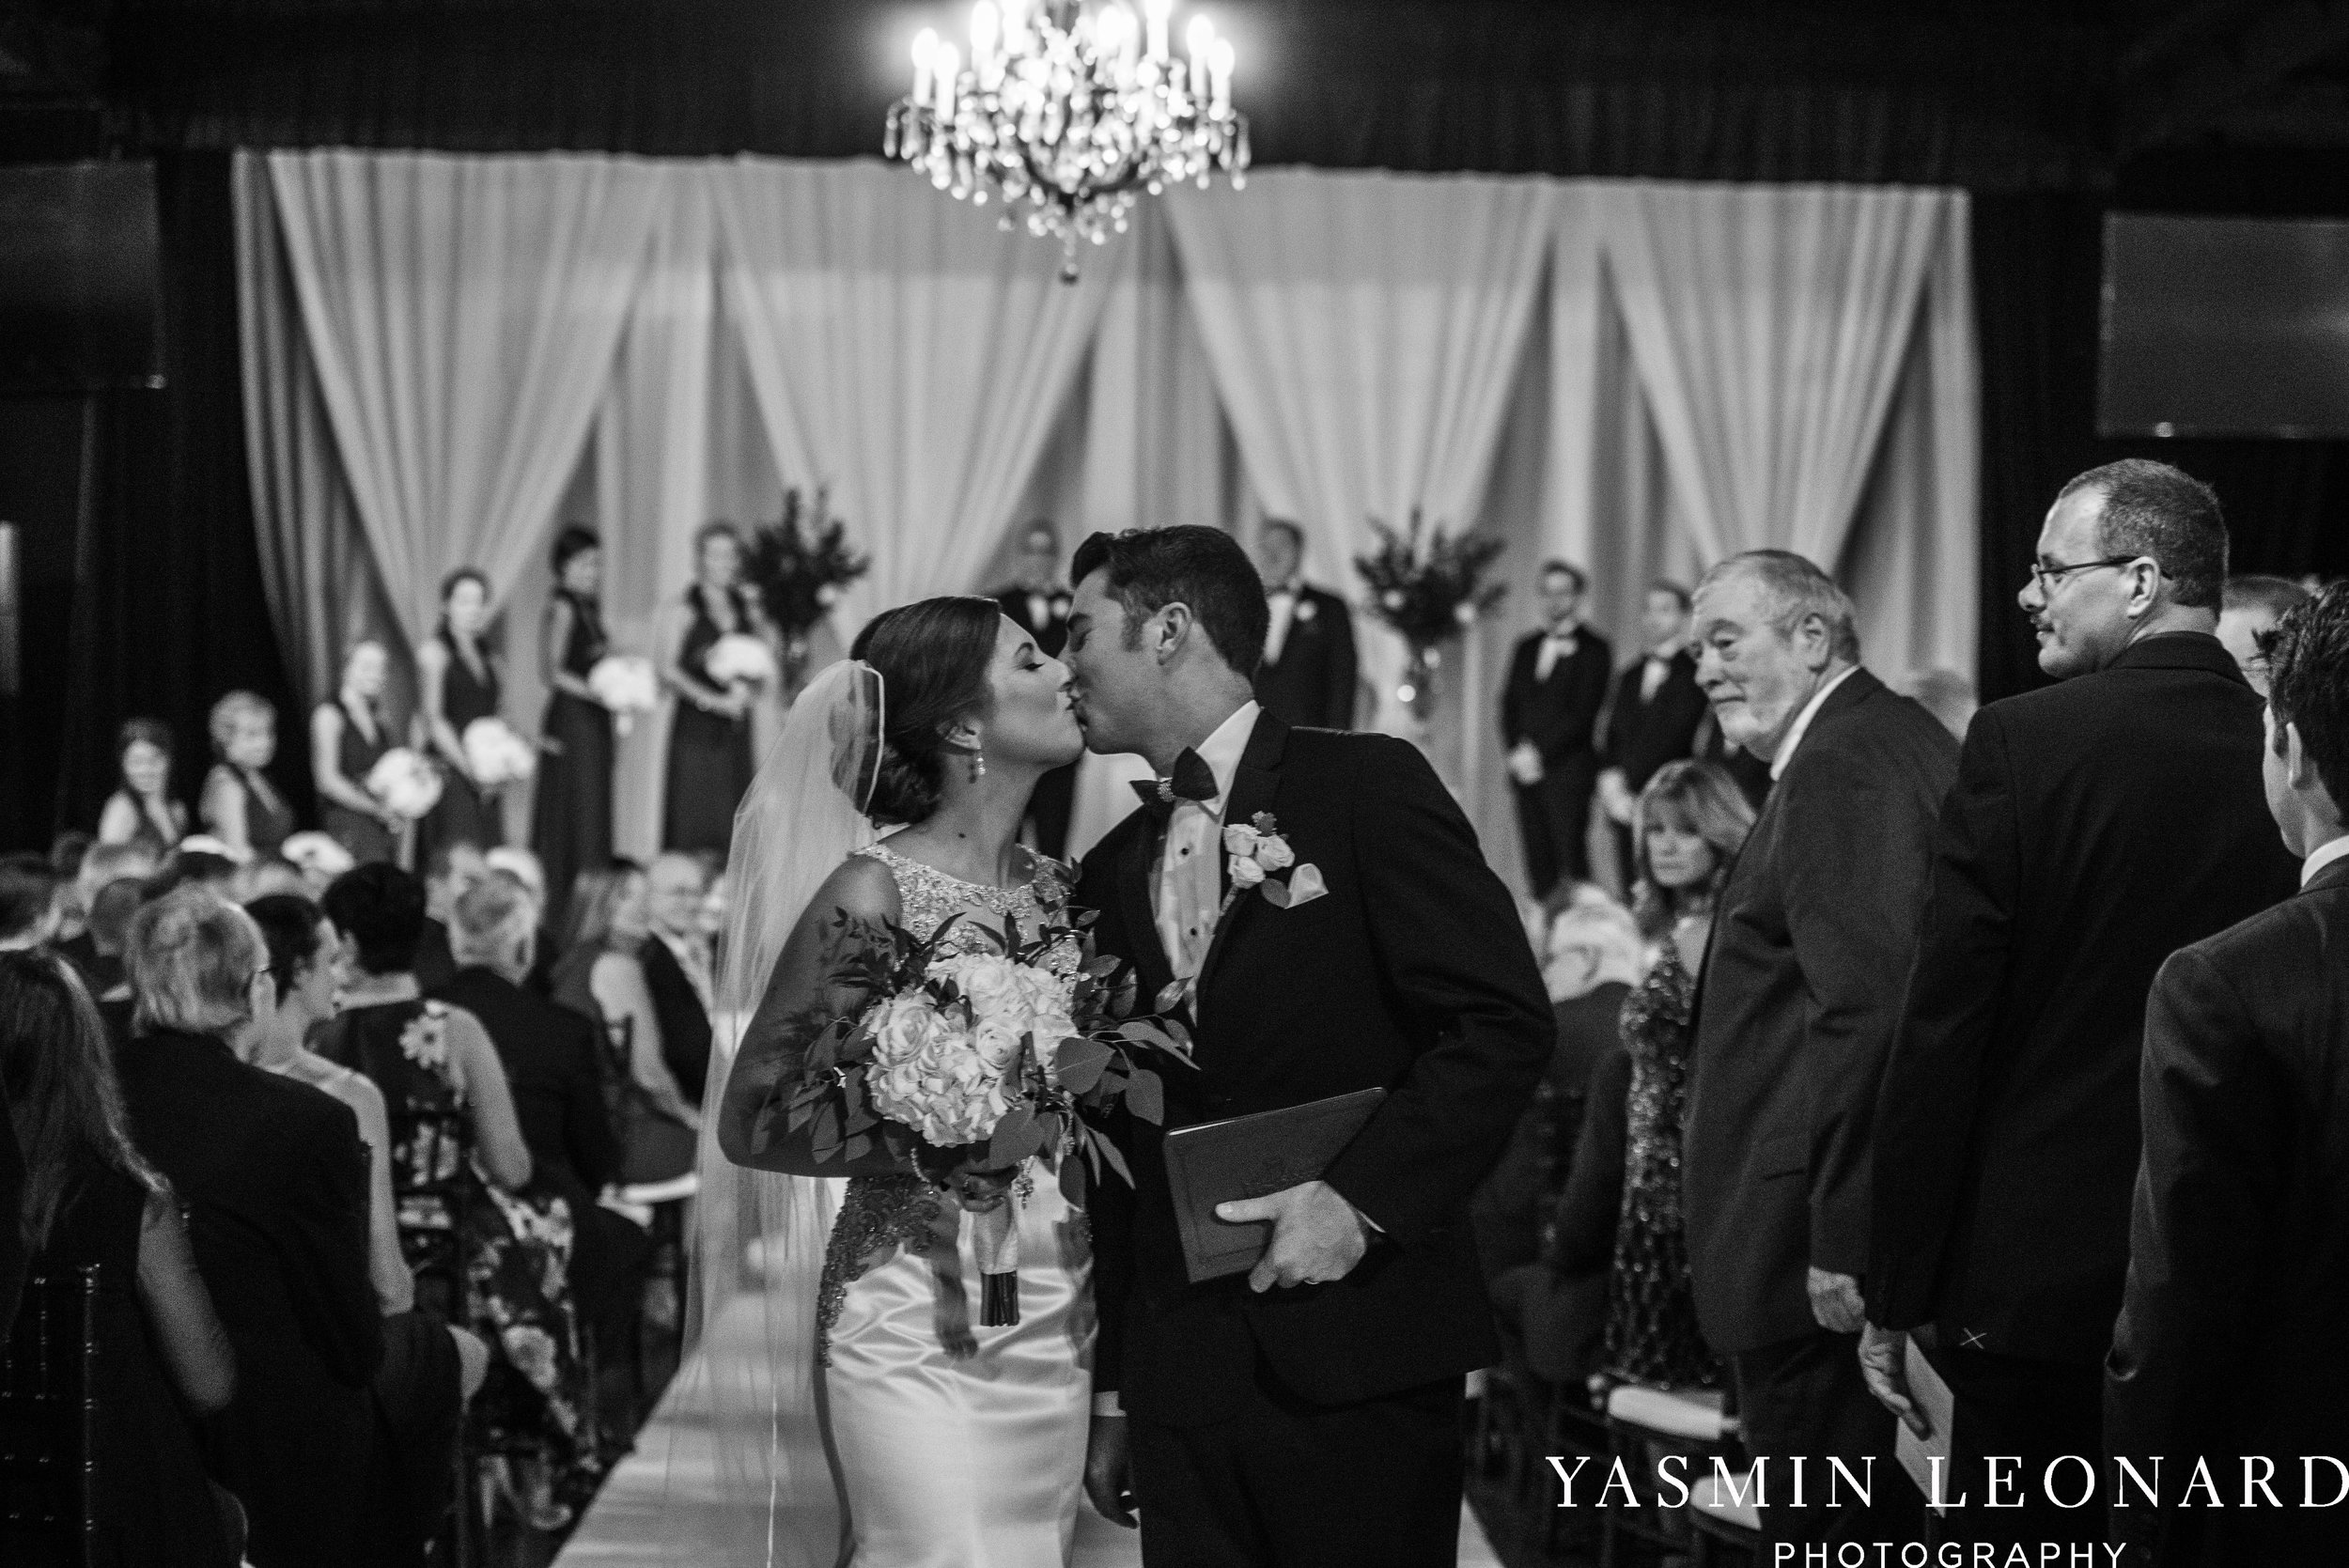 Millennium Center Wedding - Downtown Winston Salem - Winston Salem Wedding Photographer - Winston Salem Venues - Indoor Wedding Venues - NC Wedding Photographer - Yasmin Leonard Photography-44.jpg